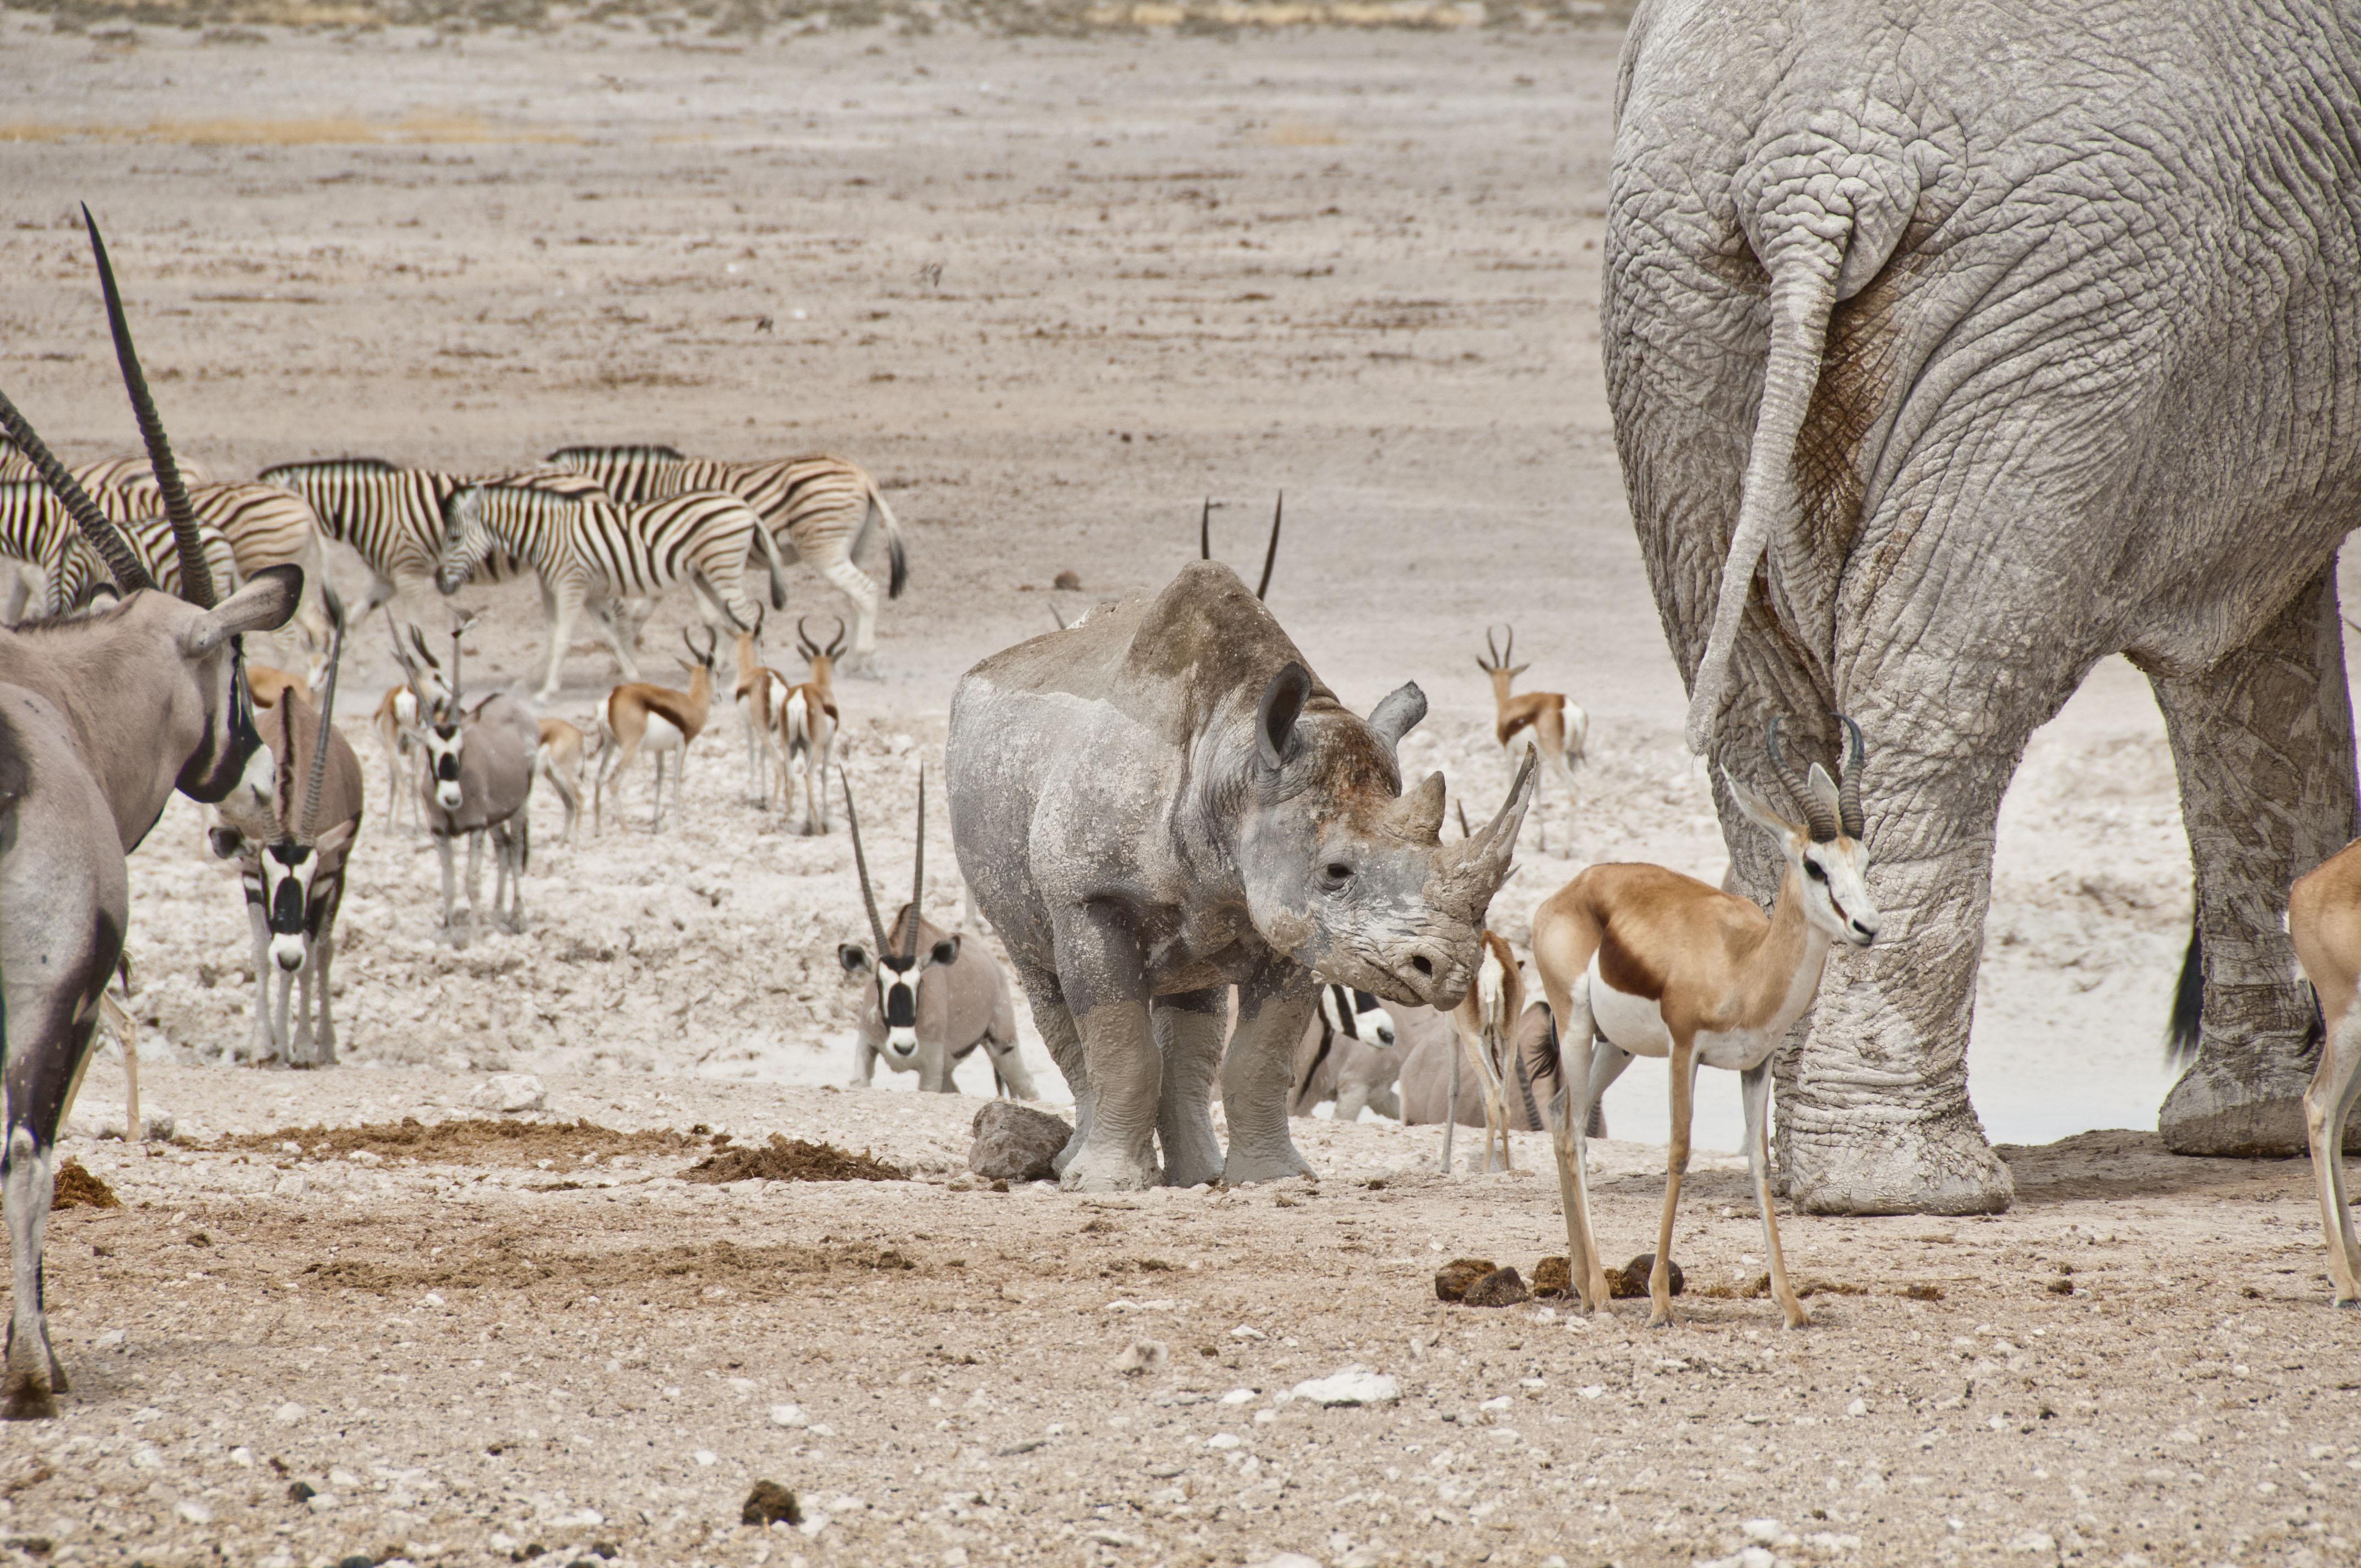 namibia_2014_kaokoveld-etoscha_083